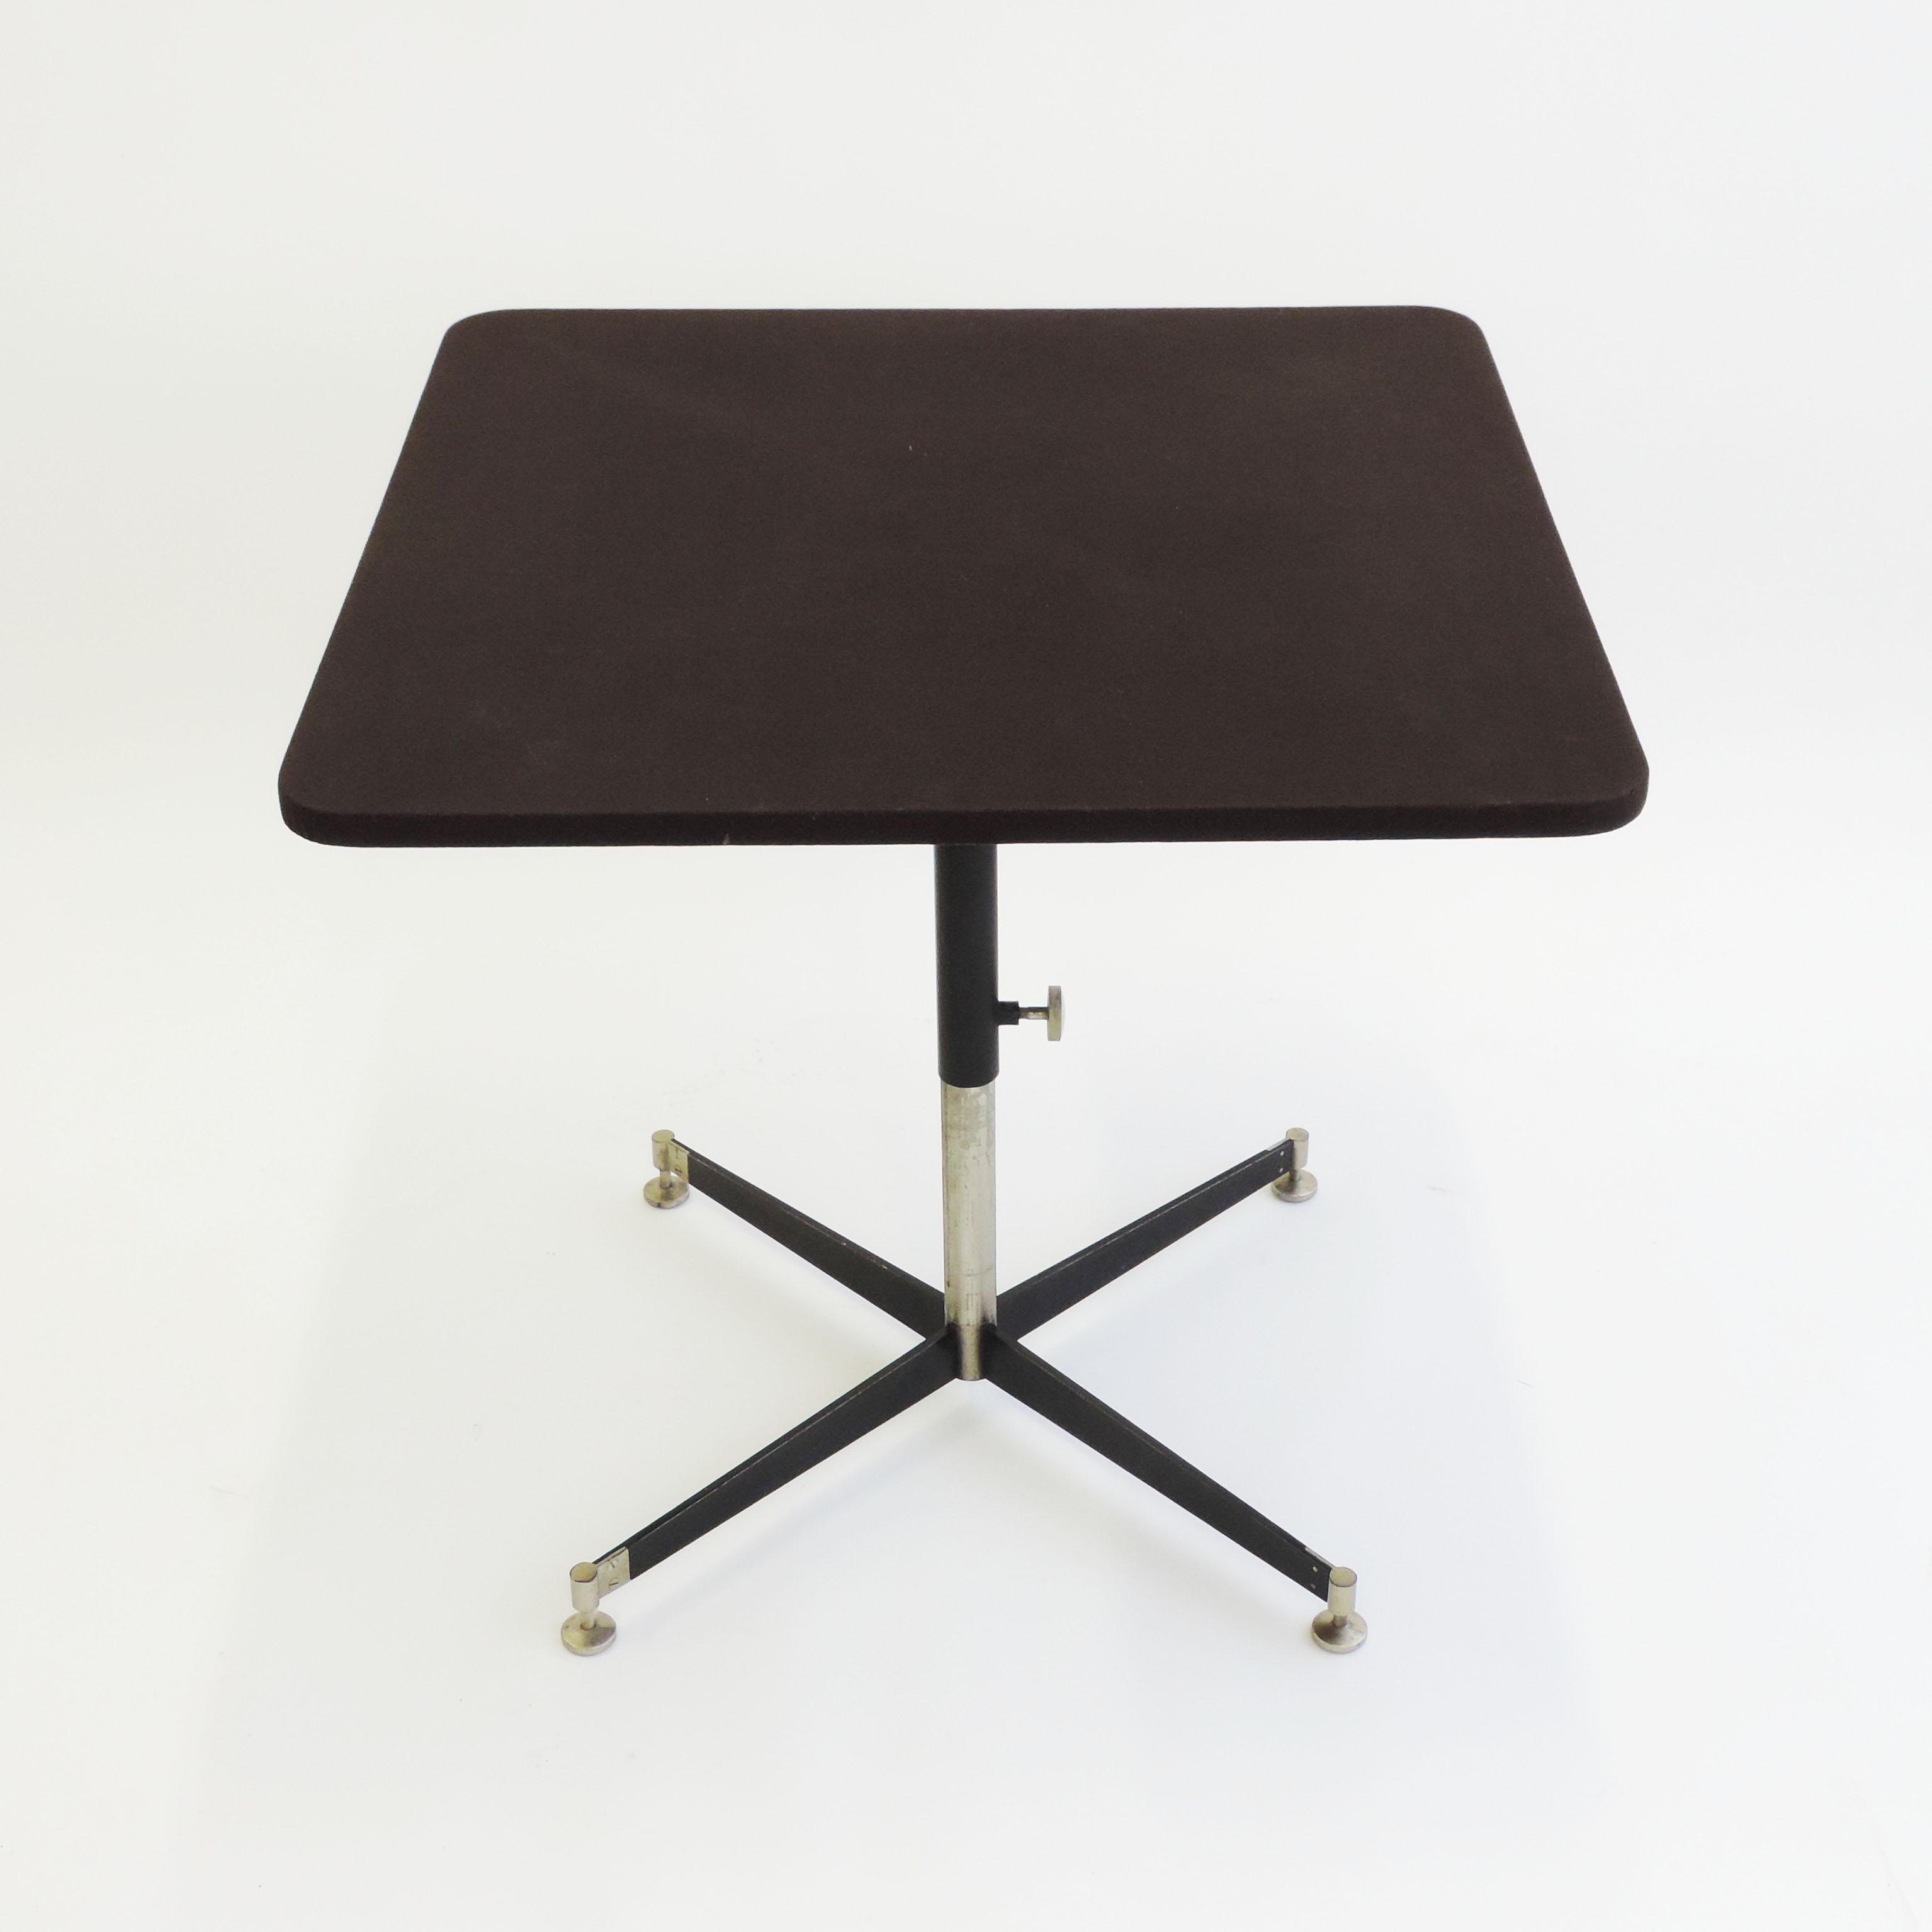 Ignazio Gardella 'T5' Adjustable Cocktail Table for Azucena